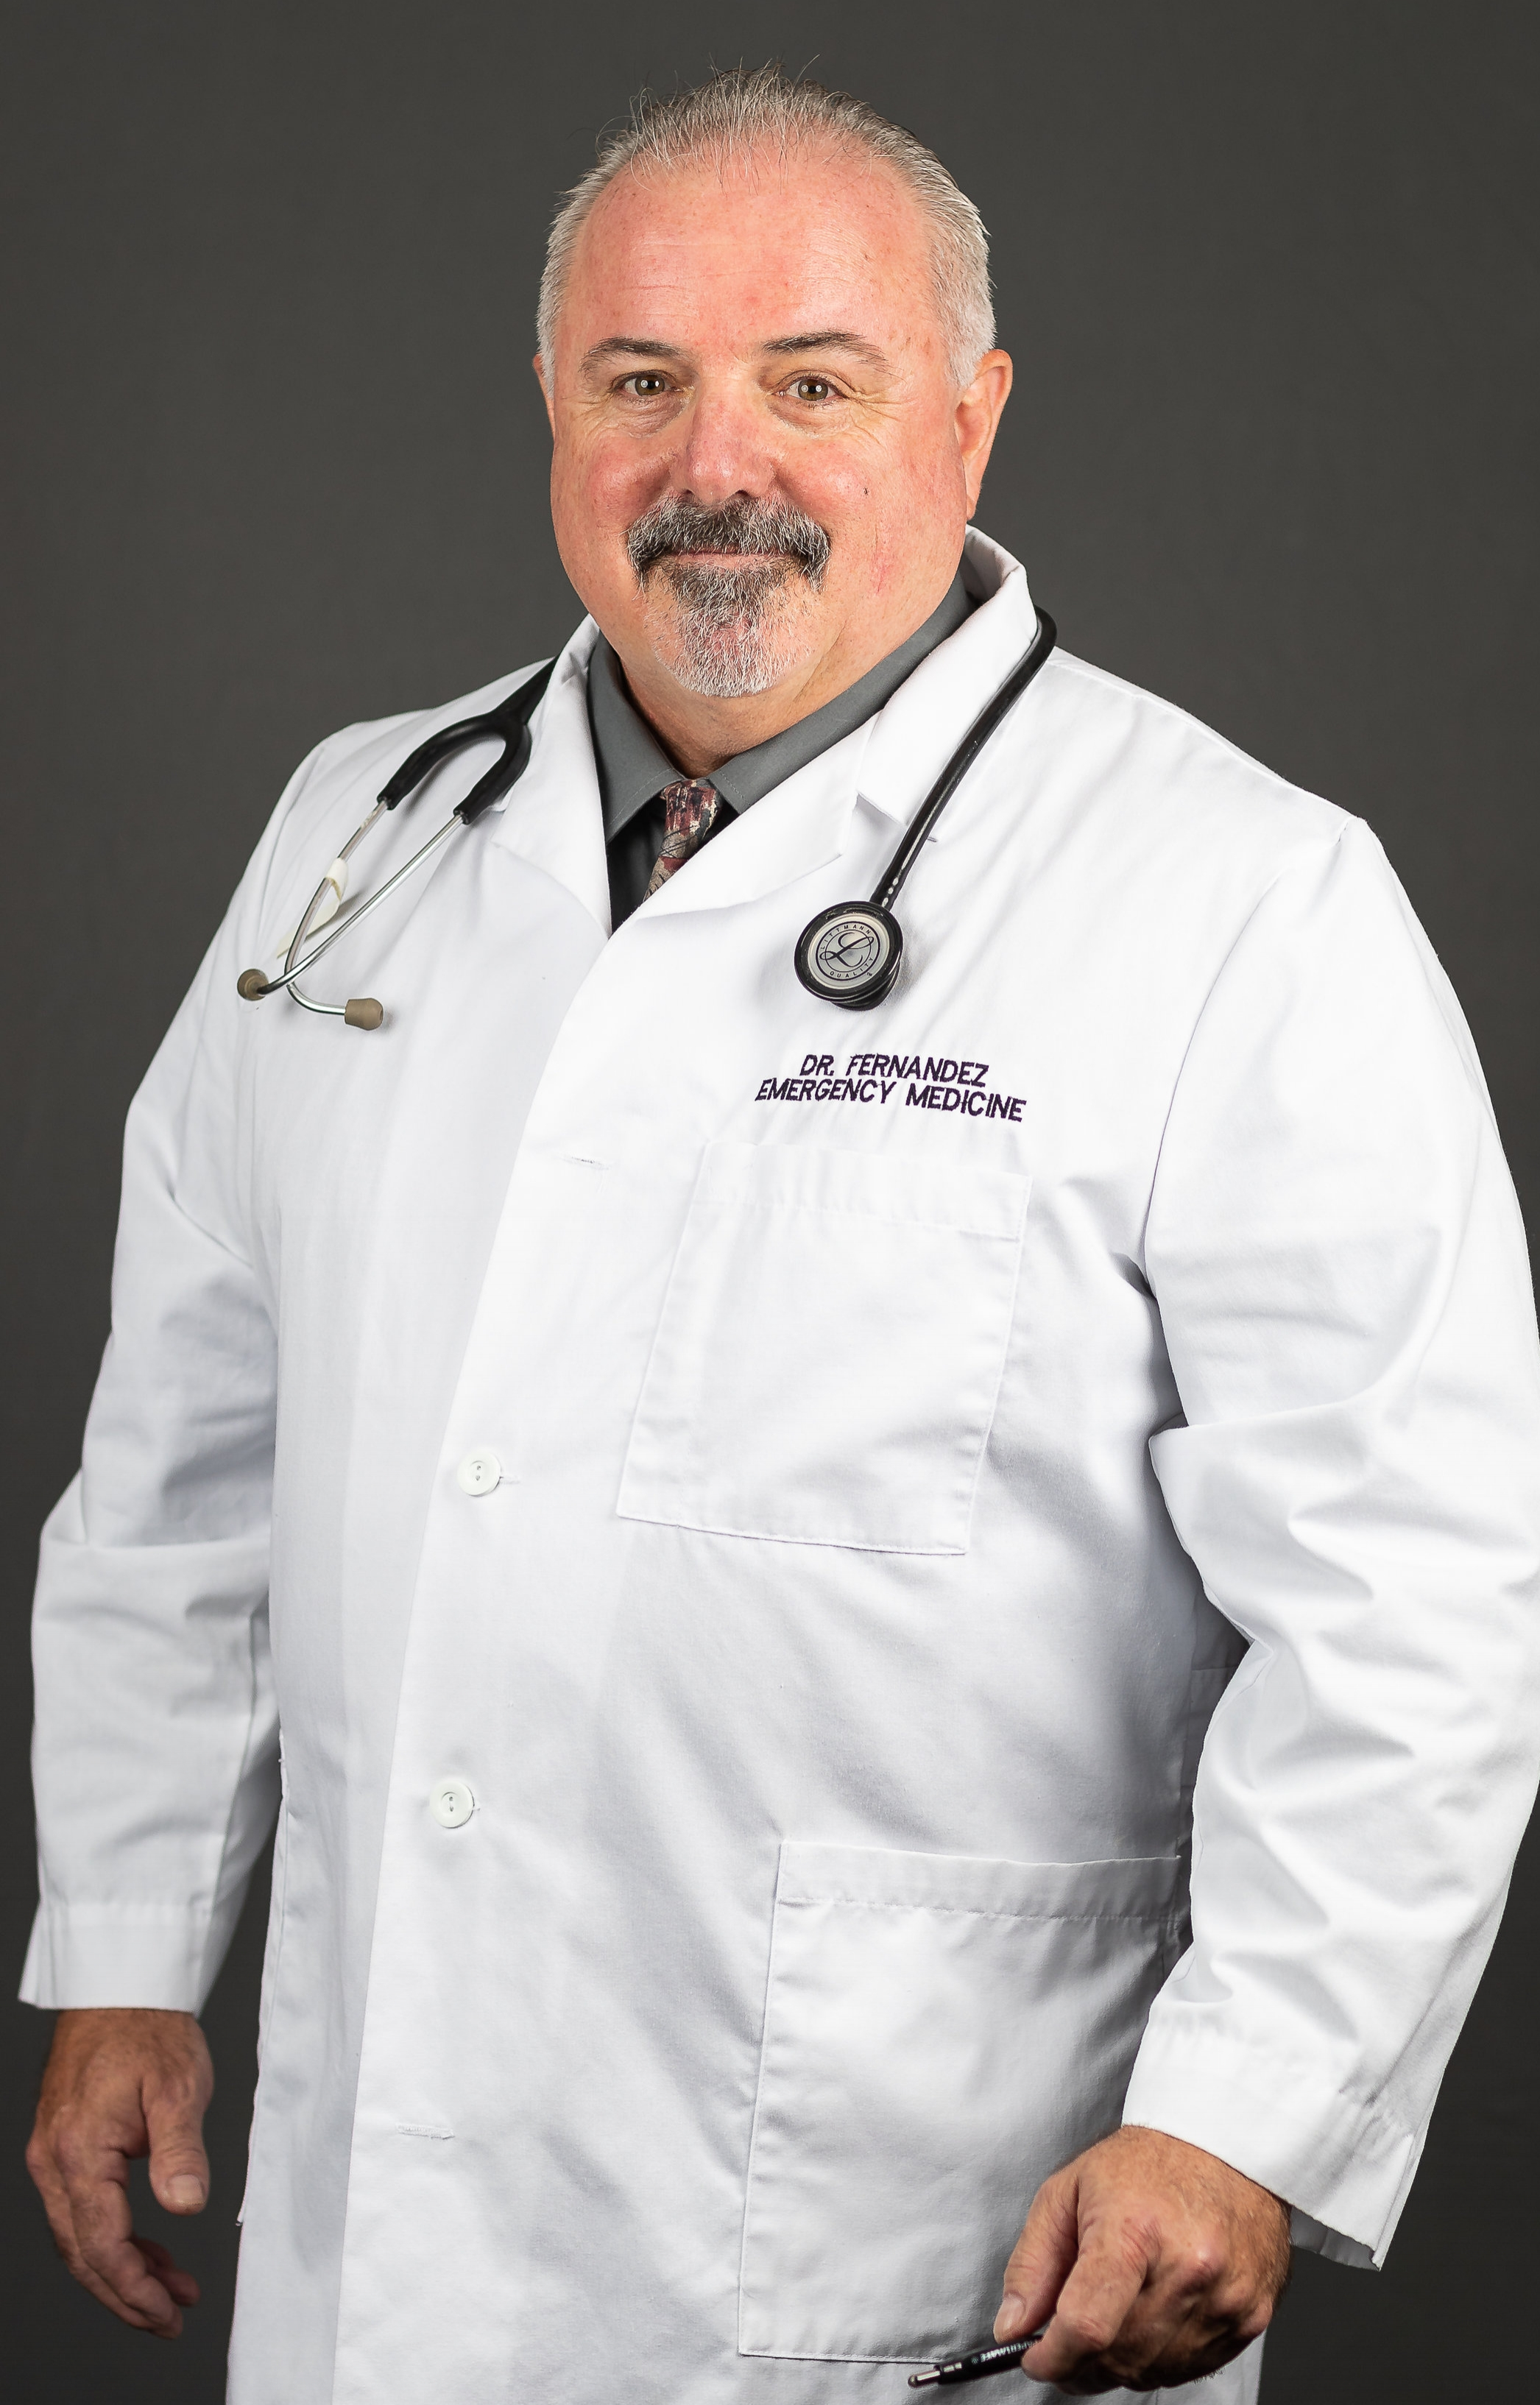 John R. Fernandez, MD